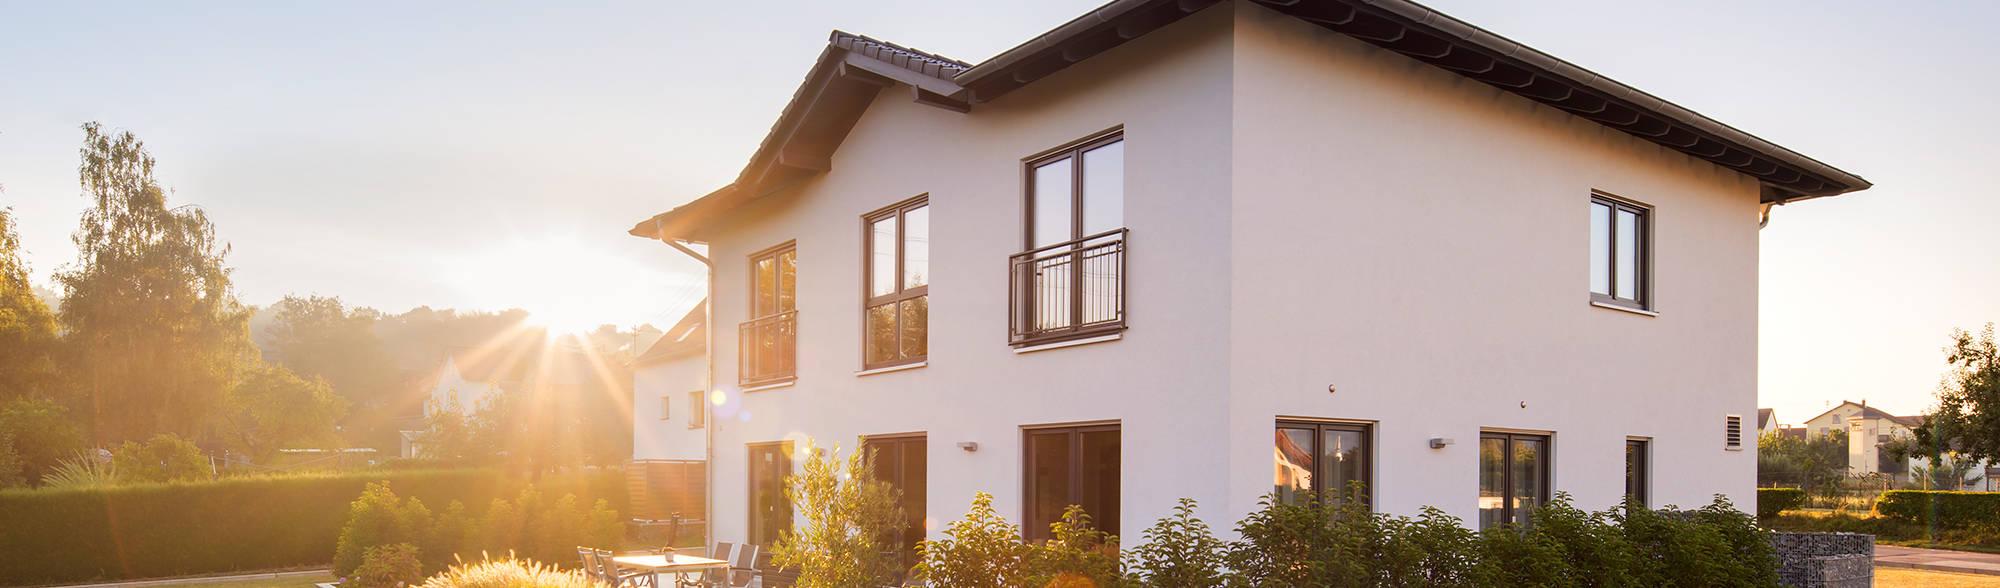 FingerHaus GmbH – Bauunternehmen in Frankenberg (Eder)